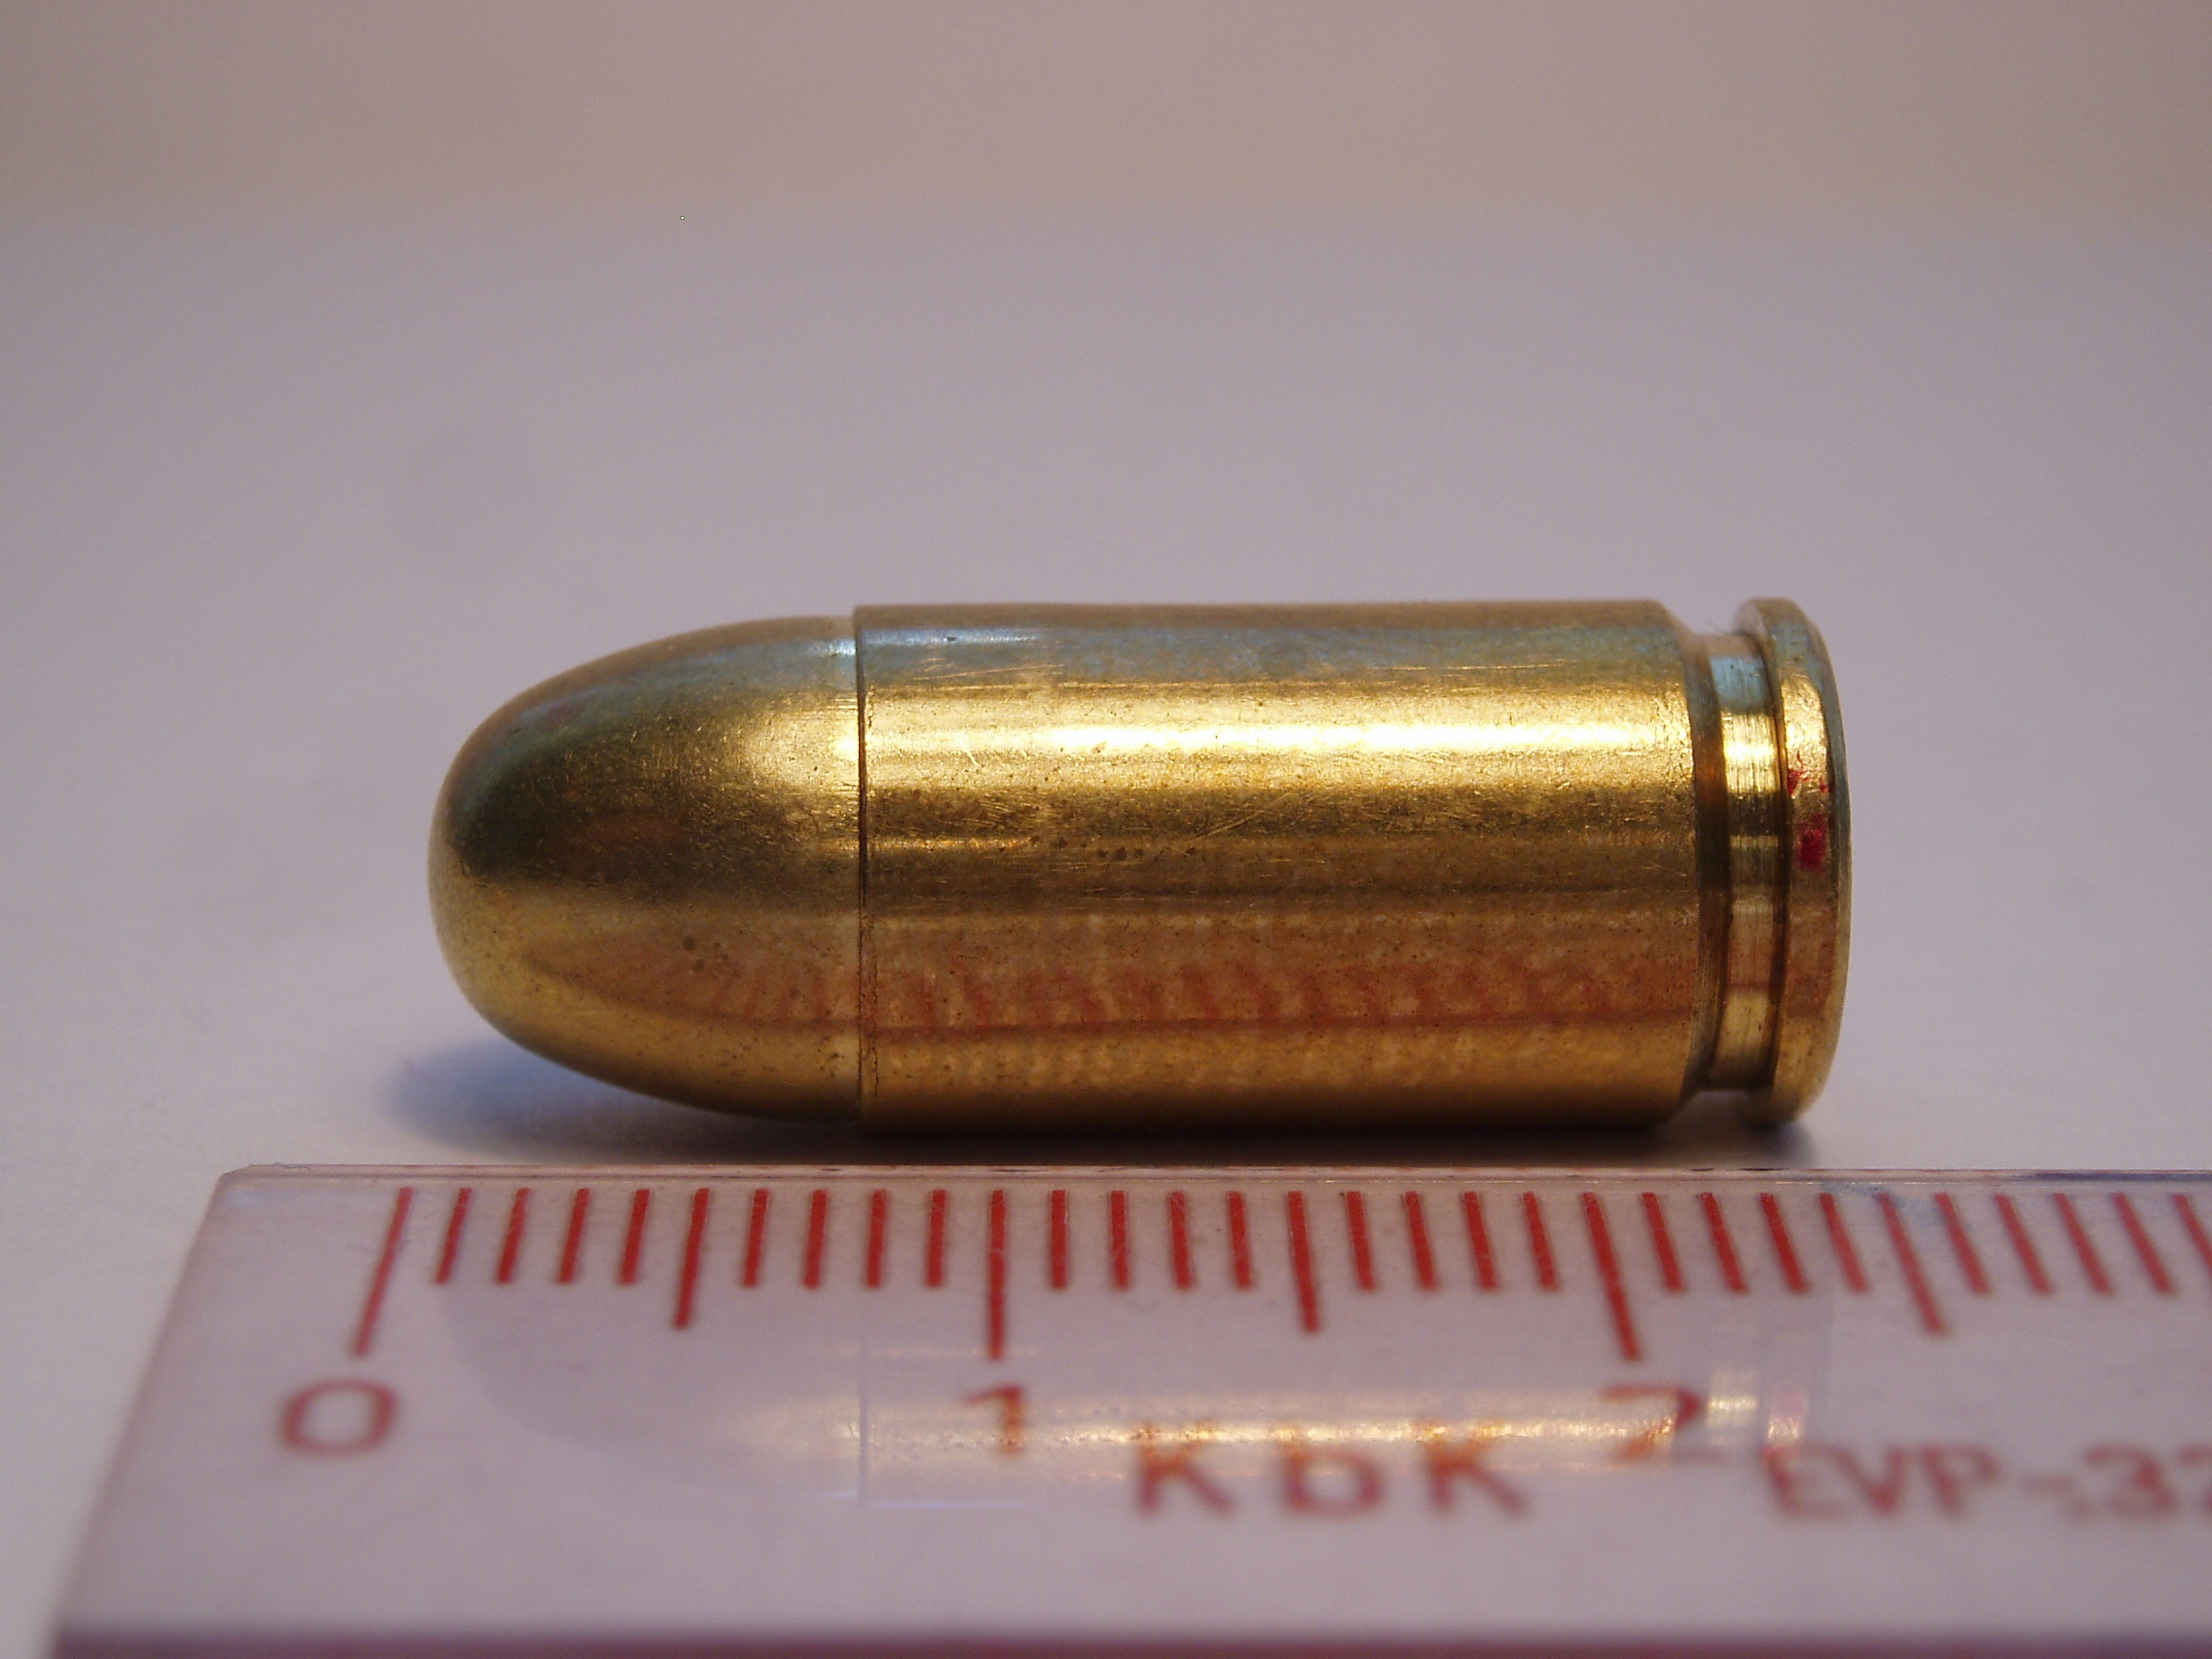 Chart Of Bullet Caliber Size: 380 ACP - FMJ - SB - 2.jpg - Wikimedia Commons,Chart